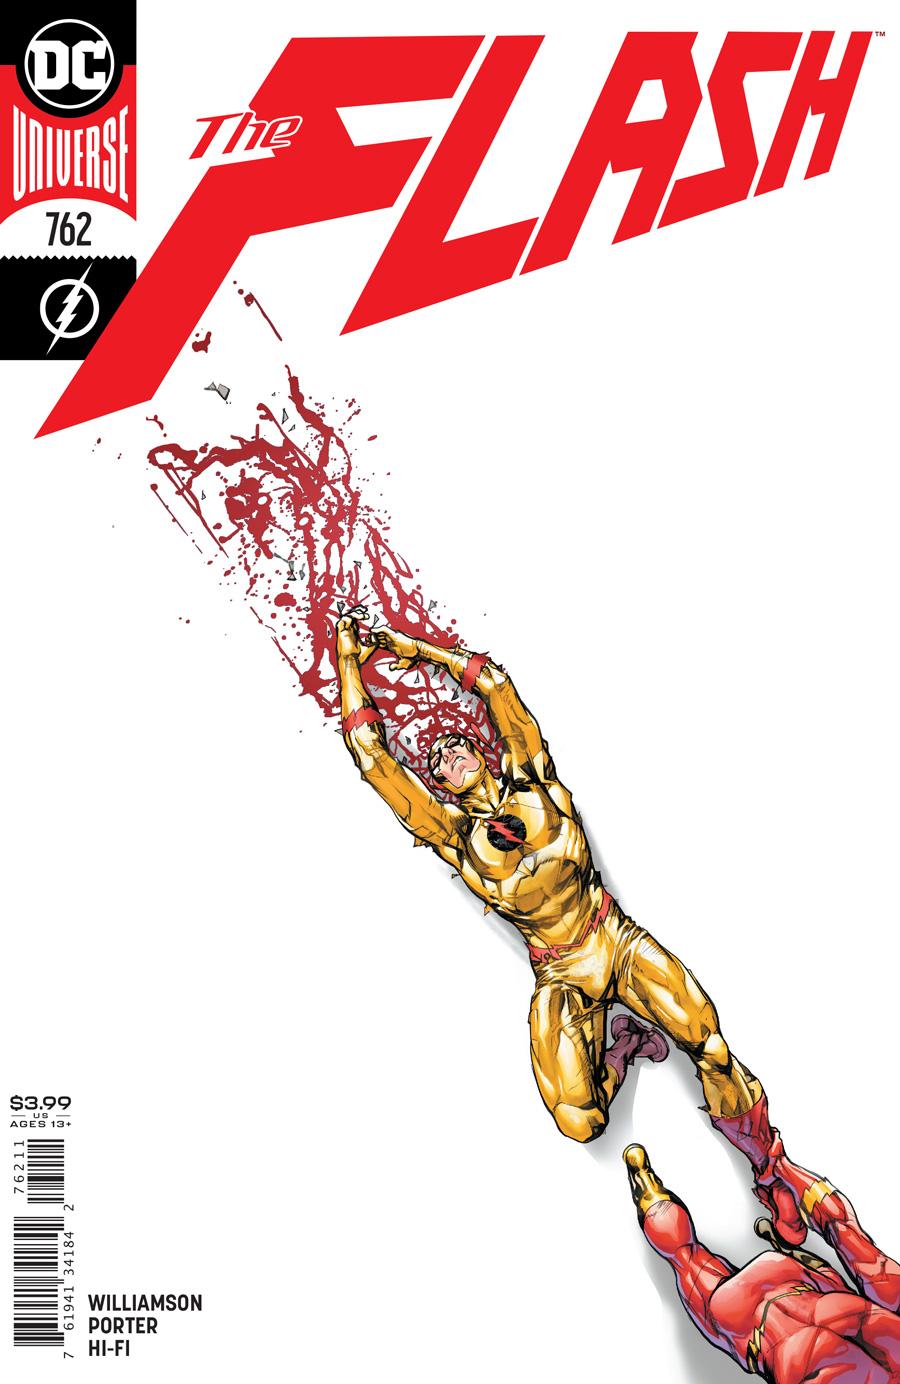 Flash Vol 1 #762 Cover A Howard Porter